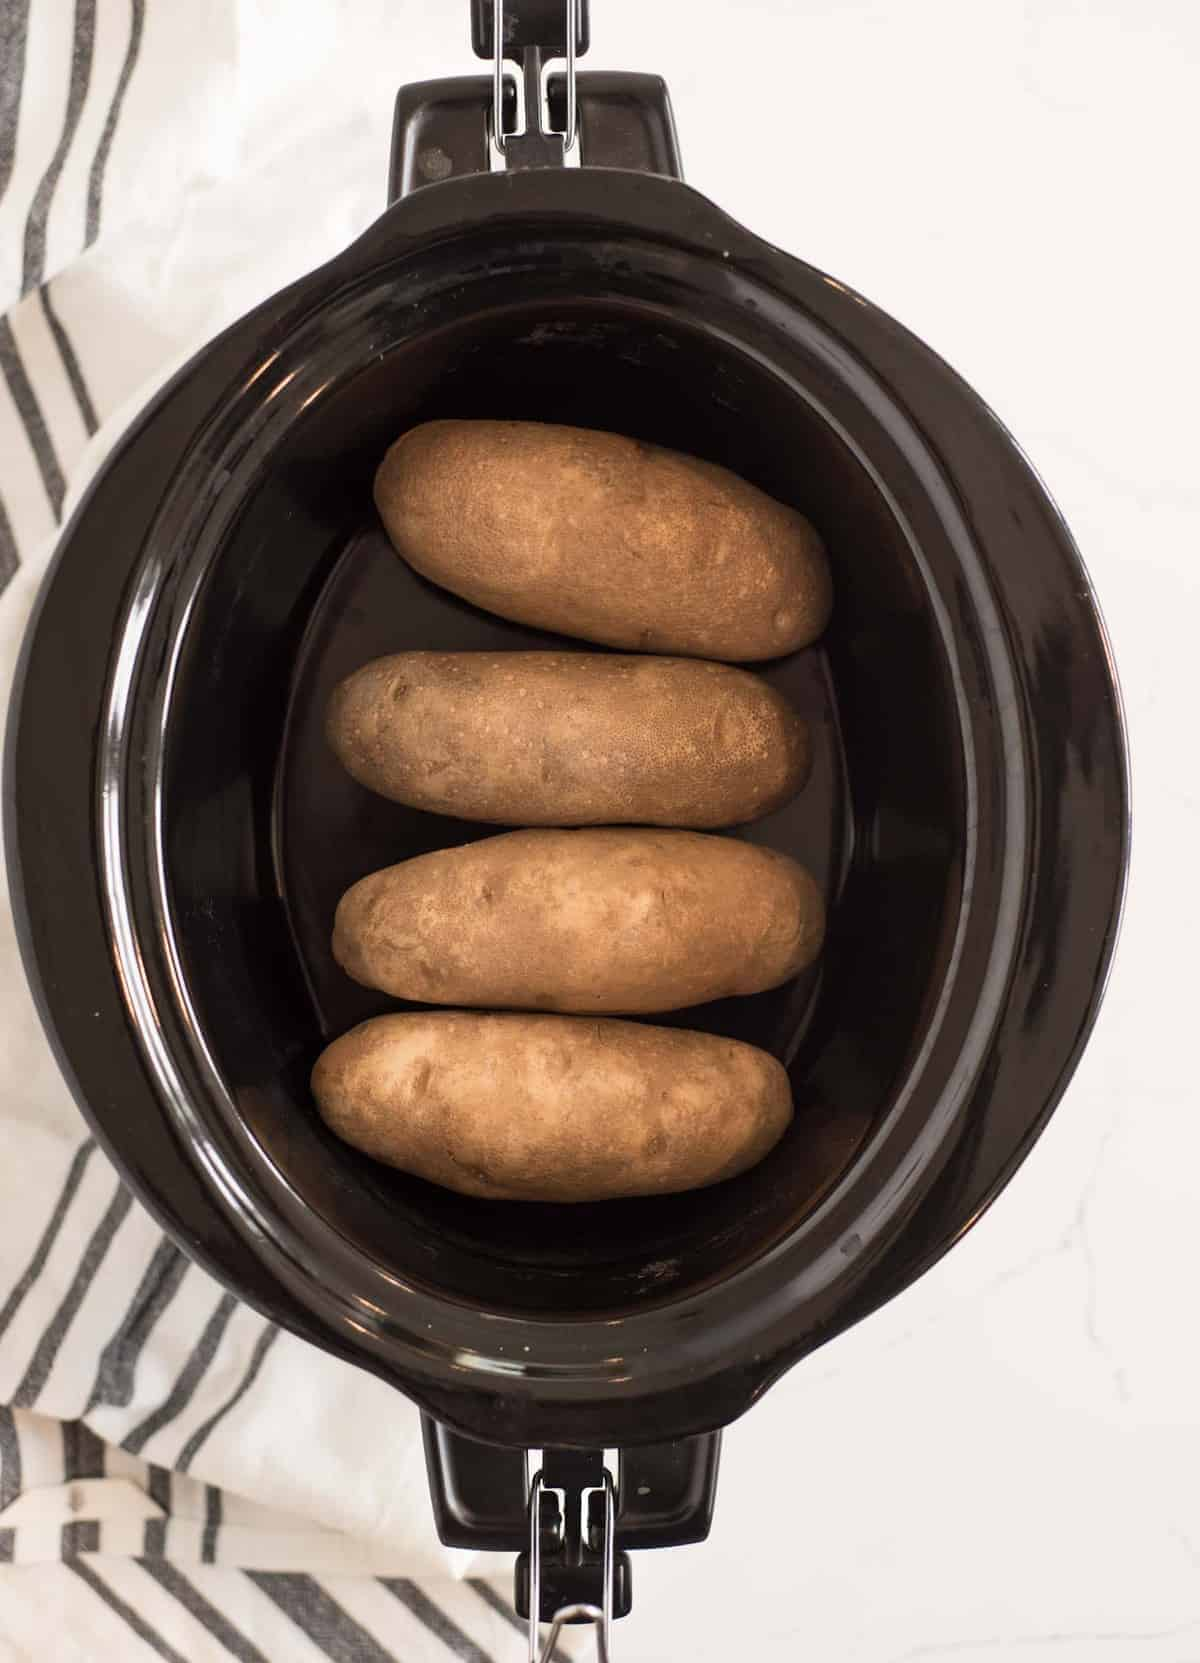 Slow Cooker Baked Potato Recipe